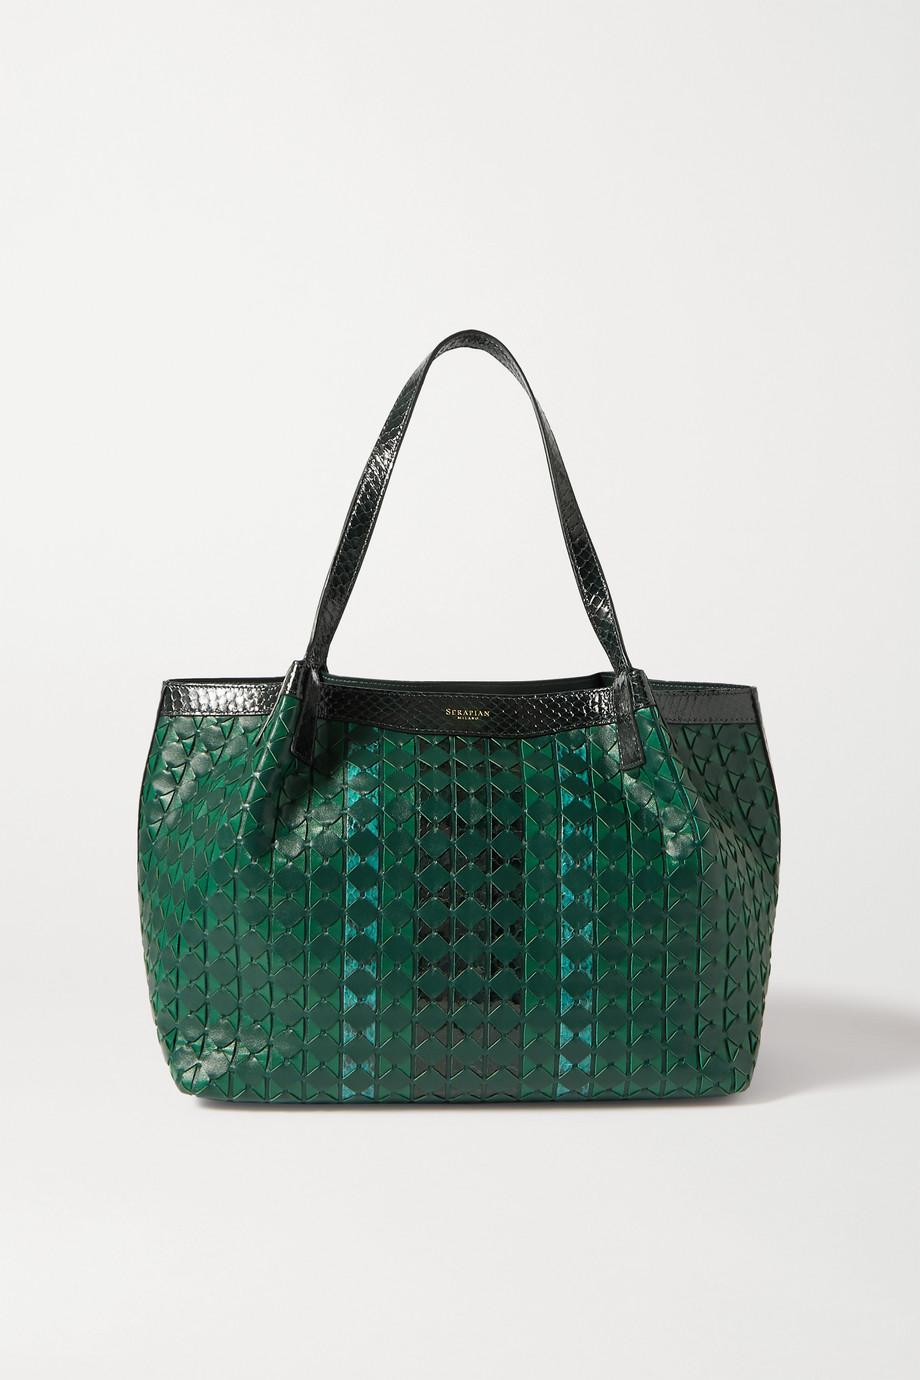 Serapian Small Secret leather and elaphe tote